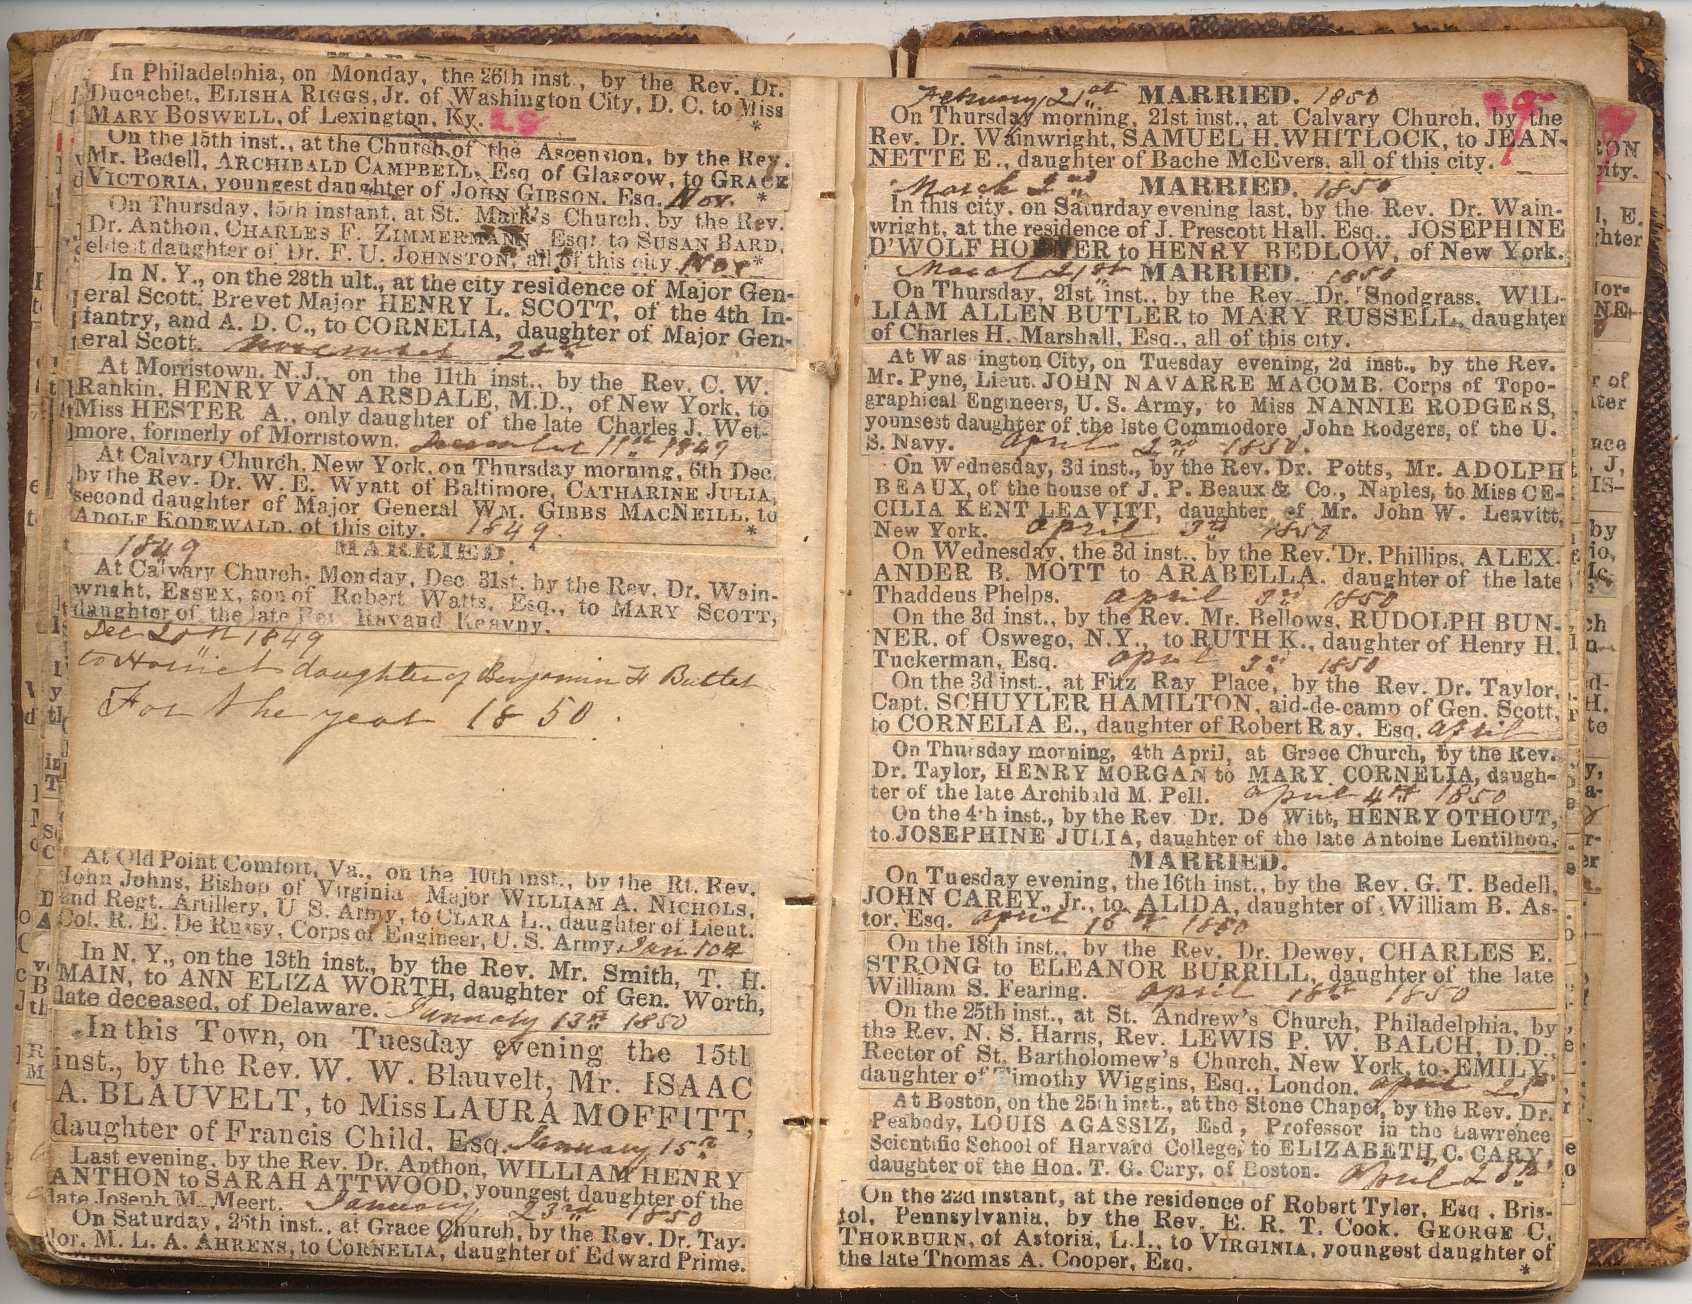 MARRIED 1849: At Cincinnati, May 8th, by the Rev. G. Driseoll, Alex. J ...